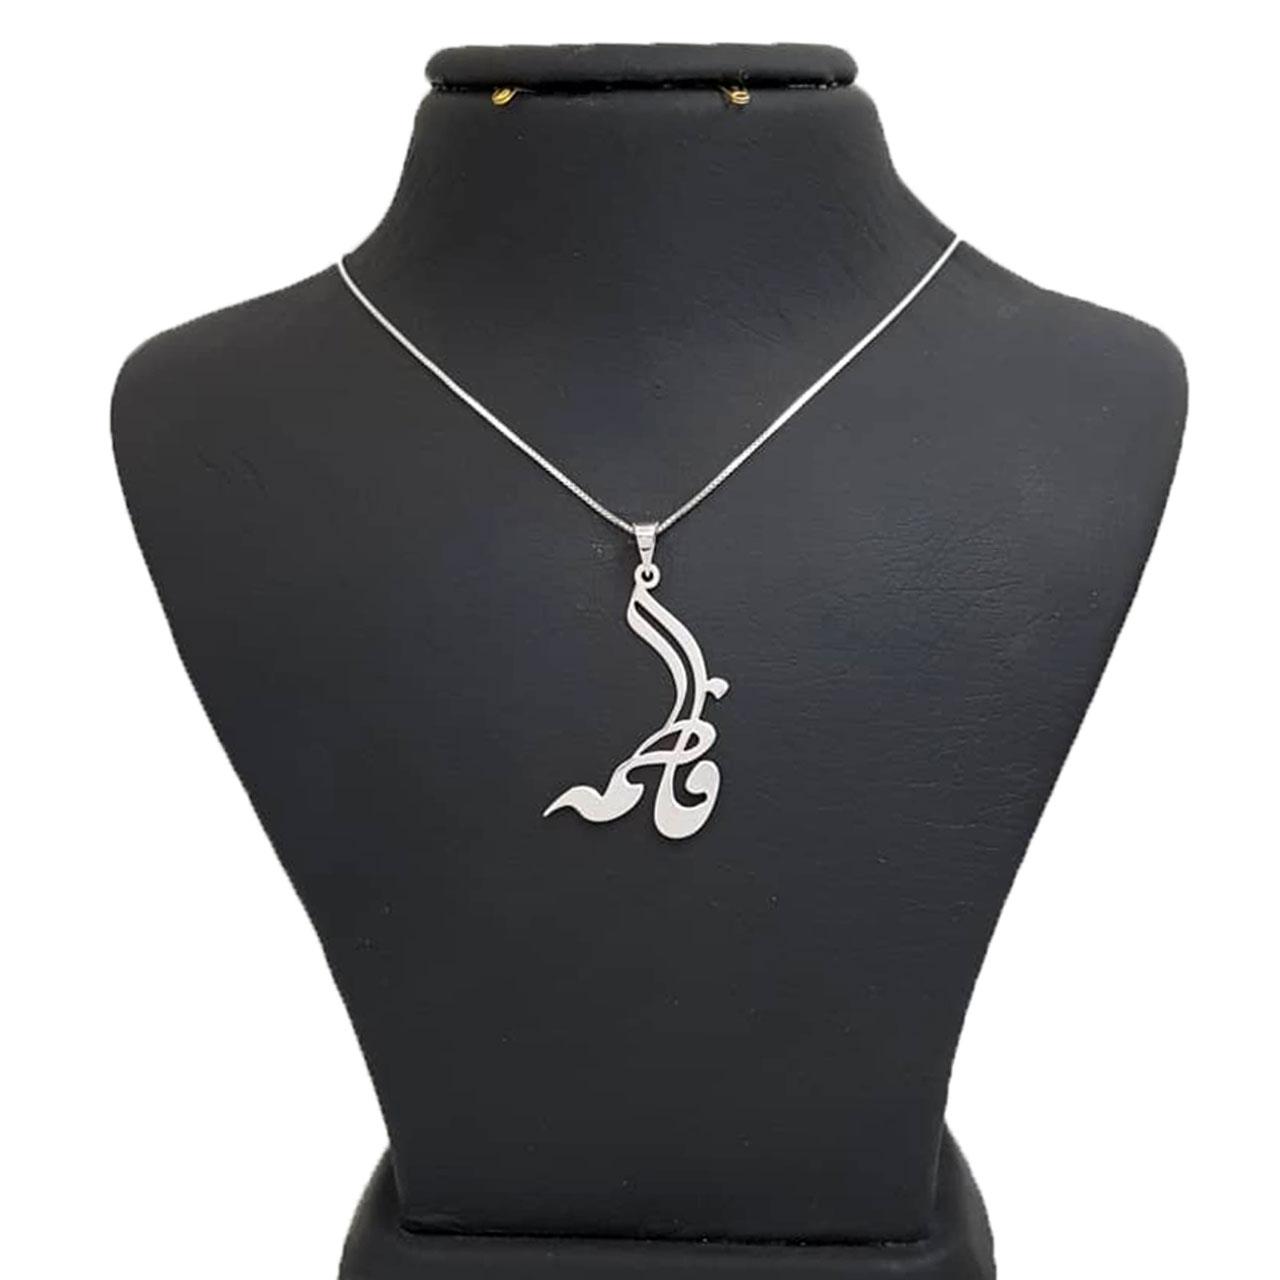 عکس گردنبند نقره طرح اسم فاطمه کد Uttd 963